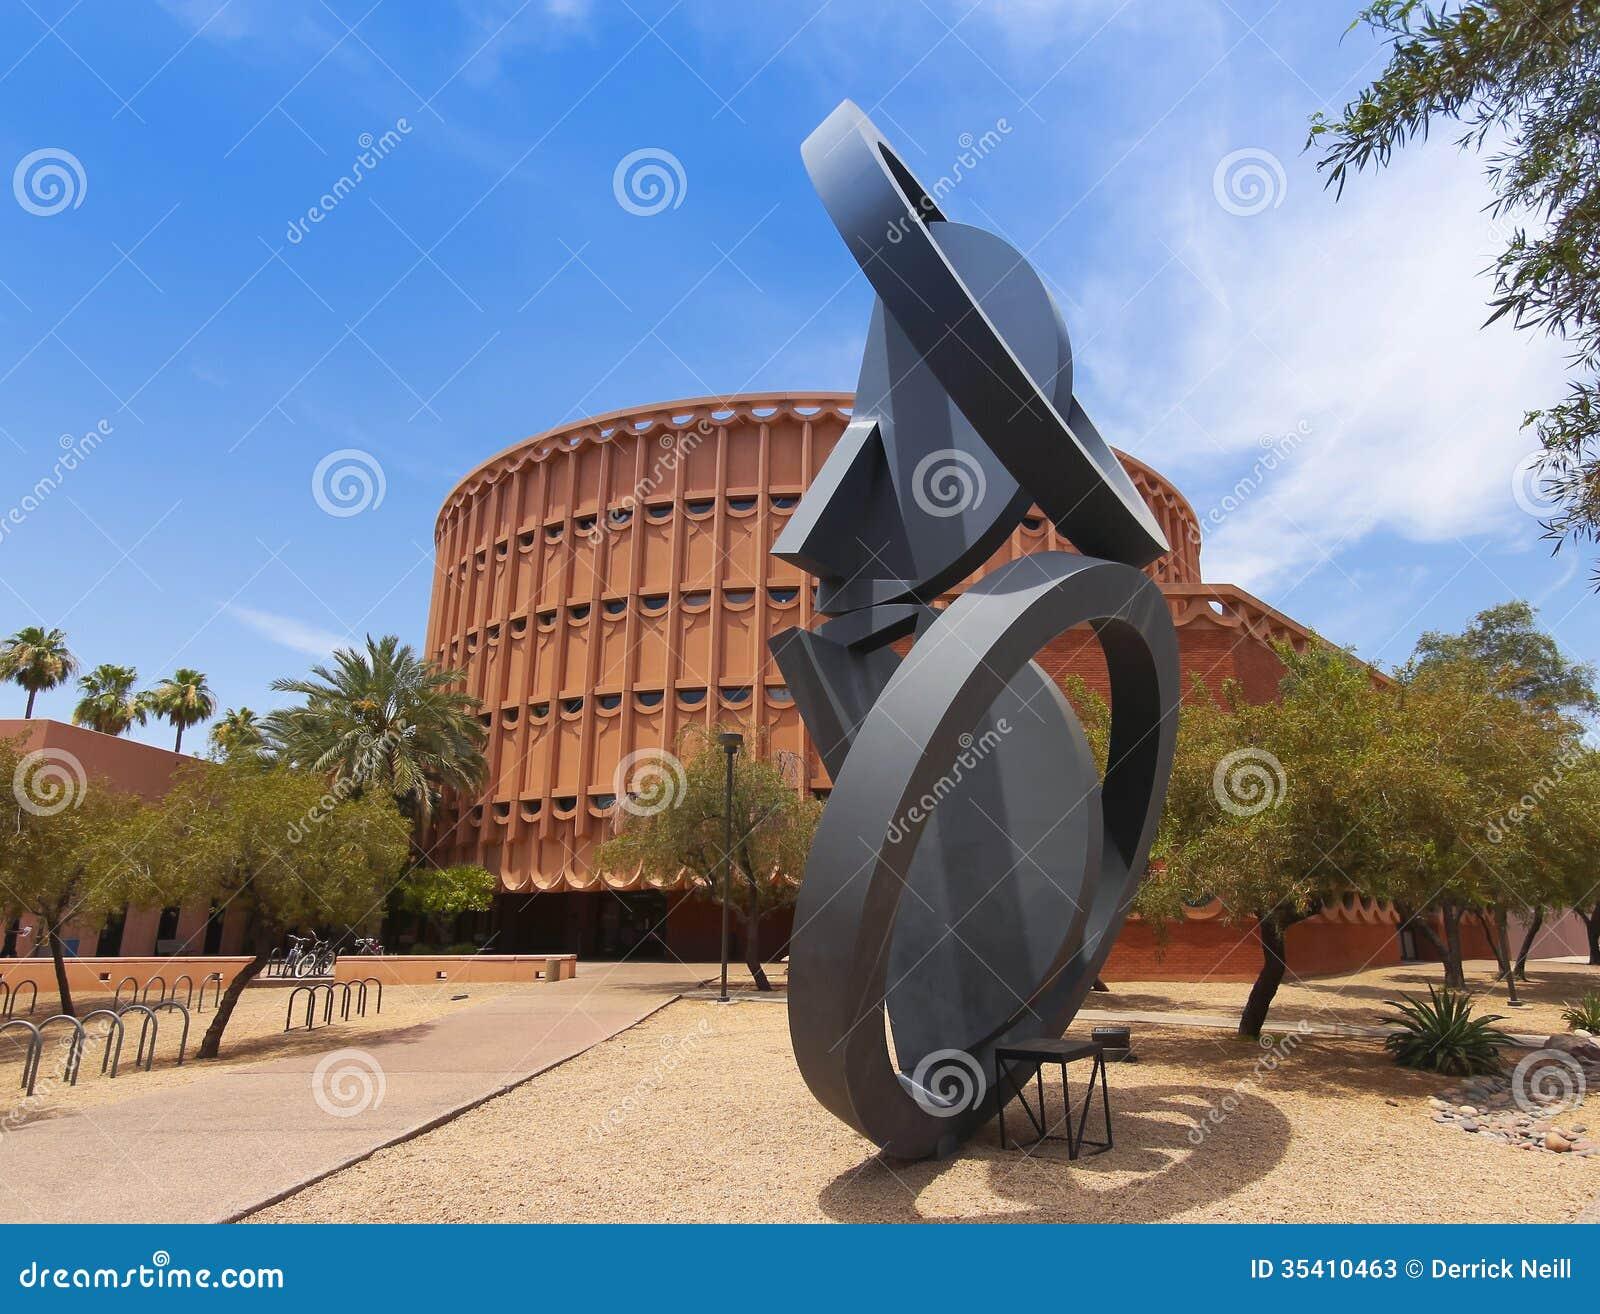 Staat Arizona Hochschulmusik Gebäude Tempe Arizona Redaktionelles